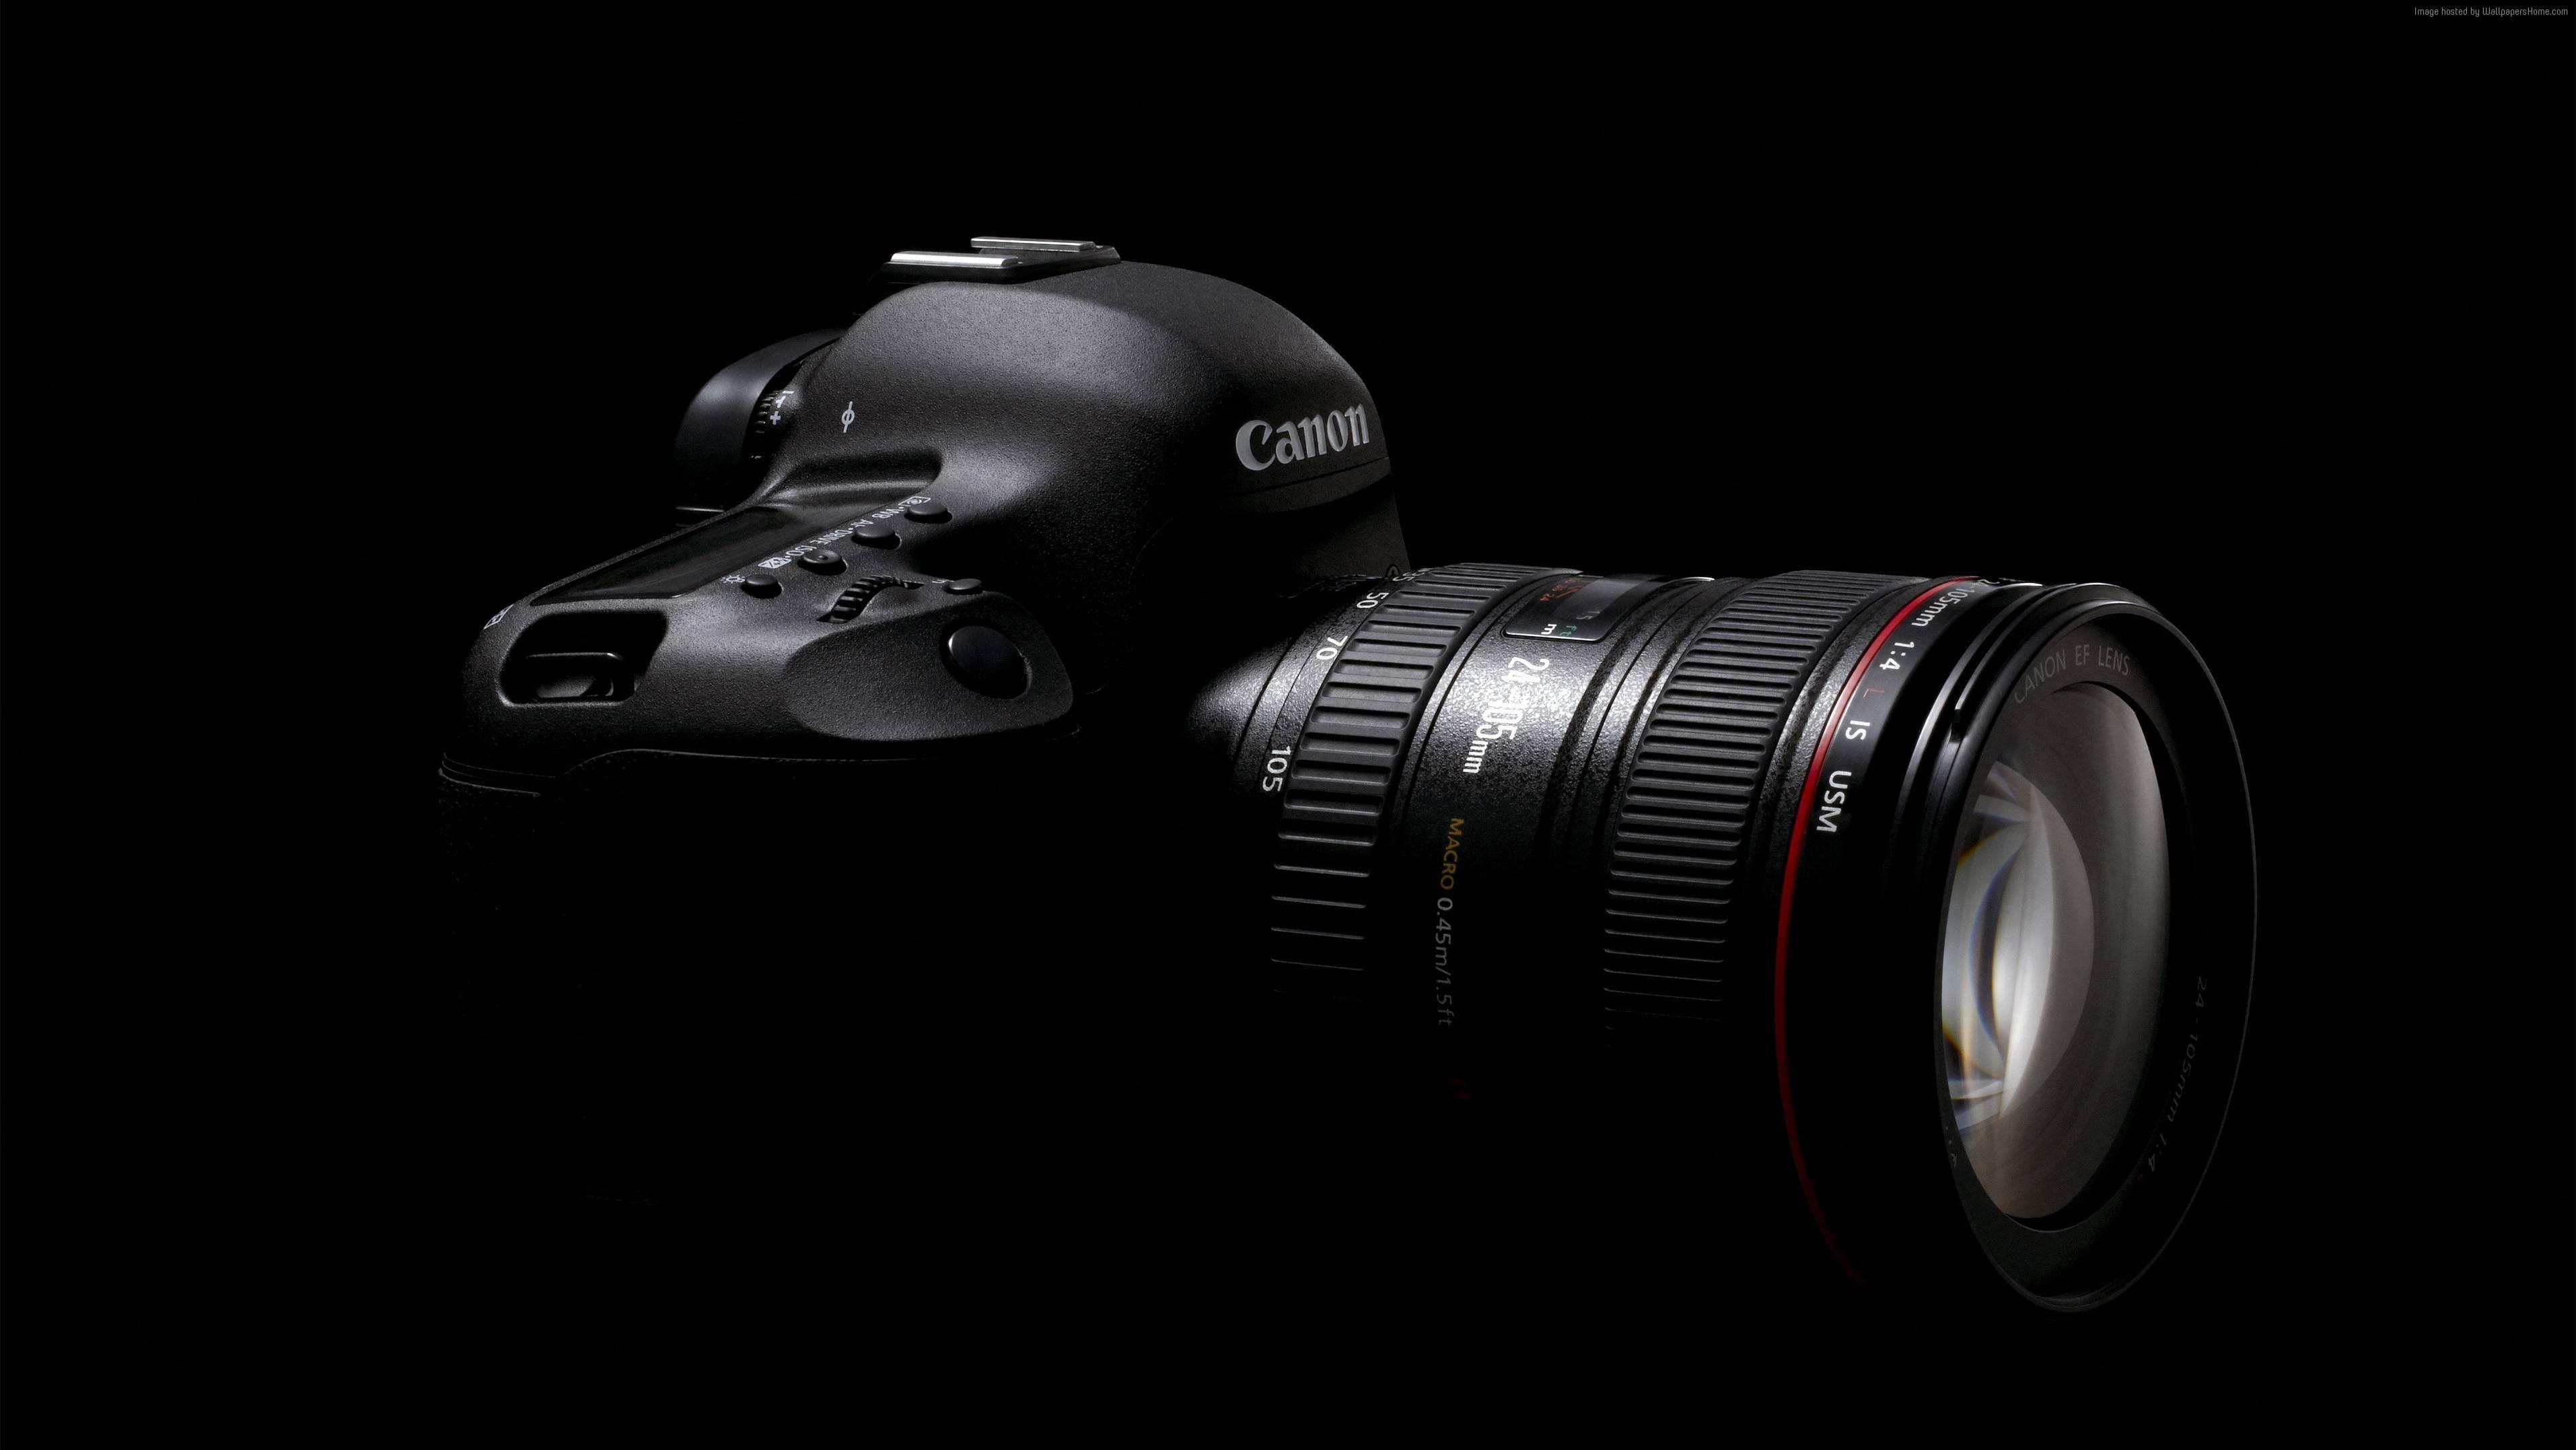 1920x1080 Rigging The Blackmagic Pocket Cinema Camera HolyManta Rapid ND Contineo Z Finder Rokinon